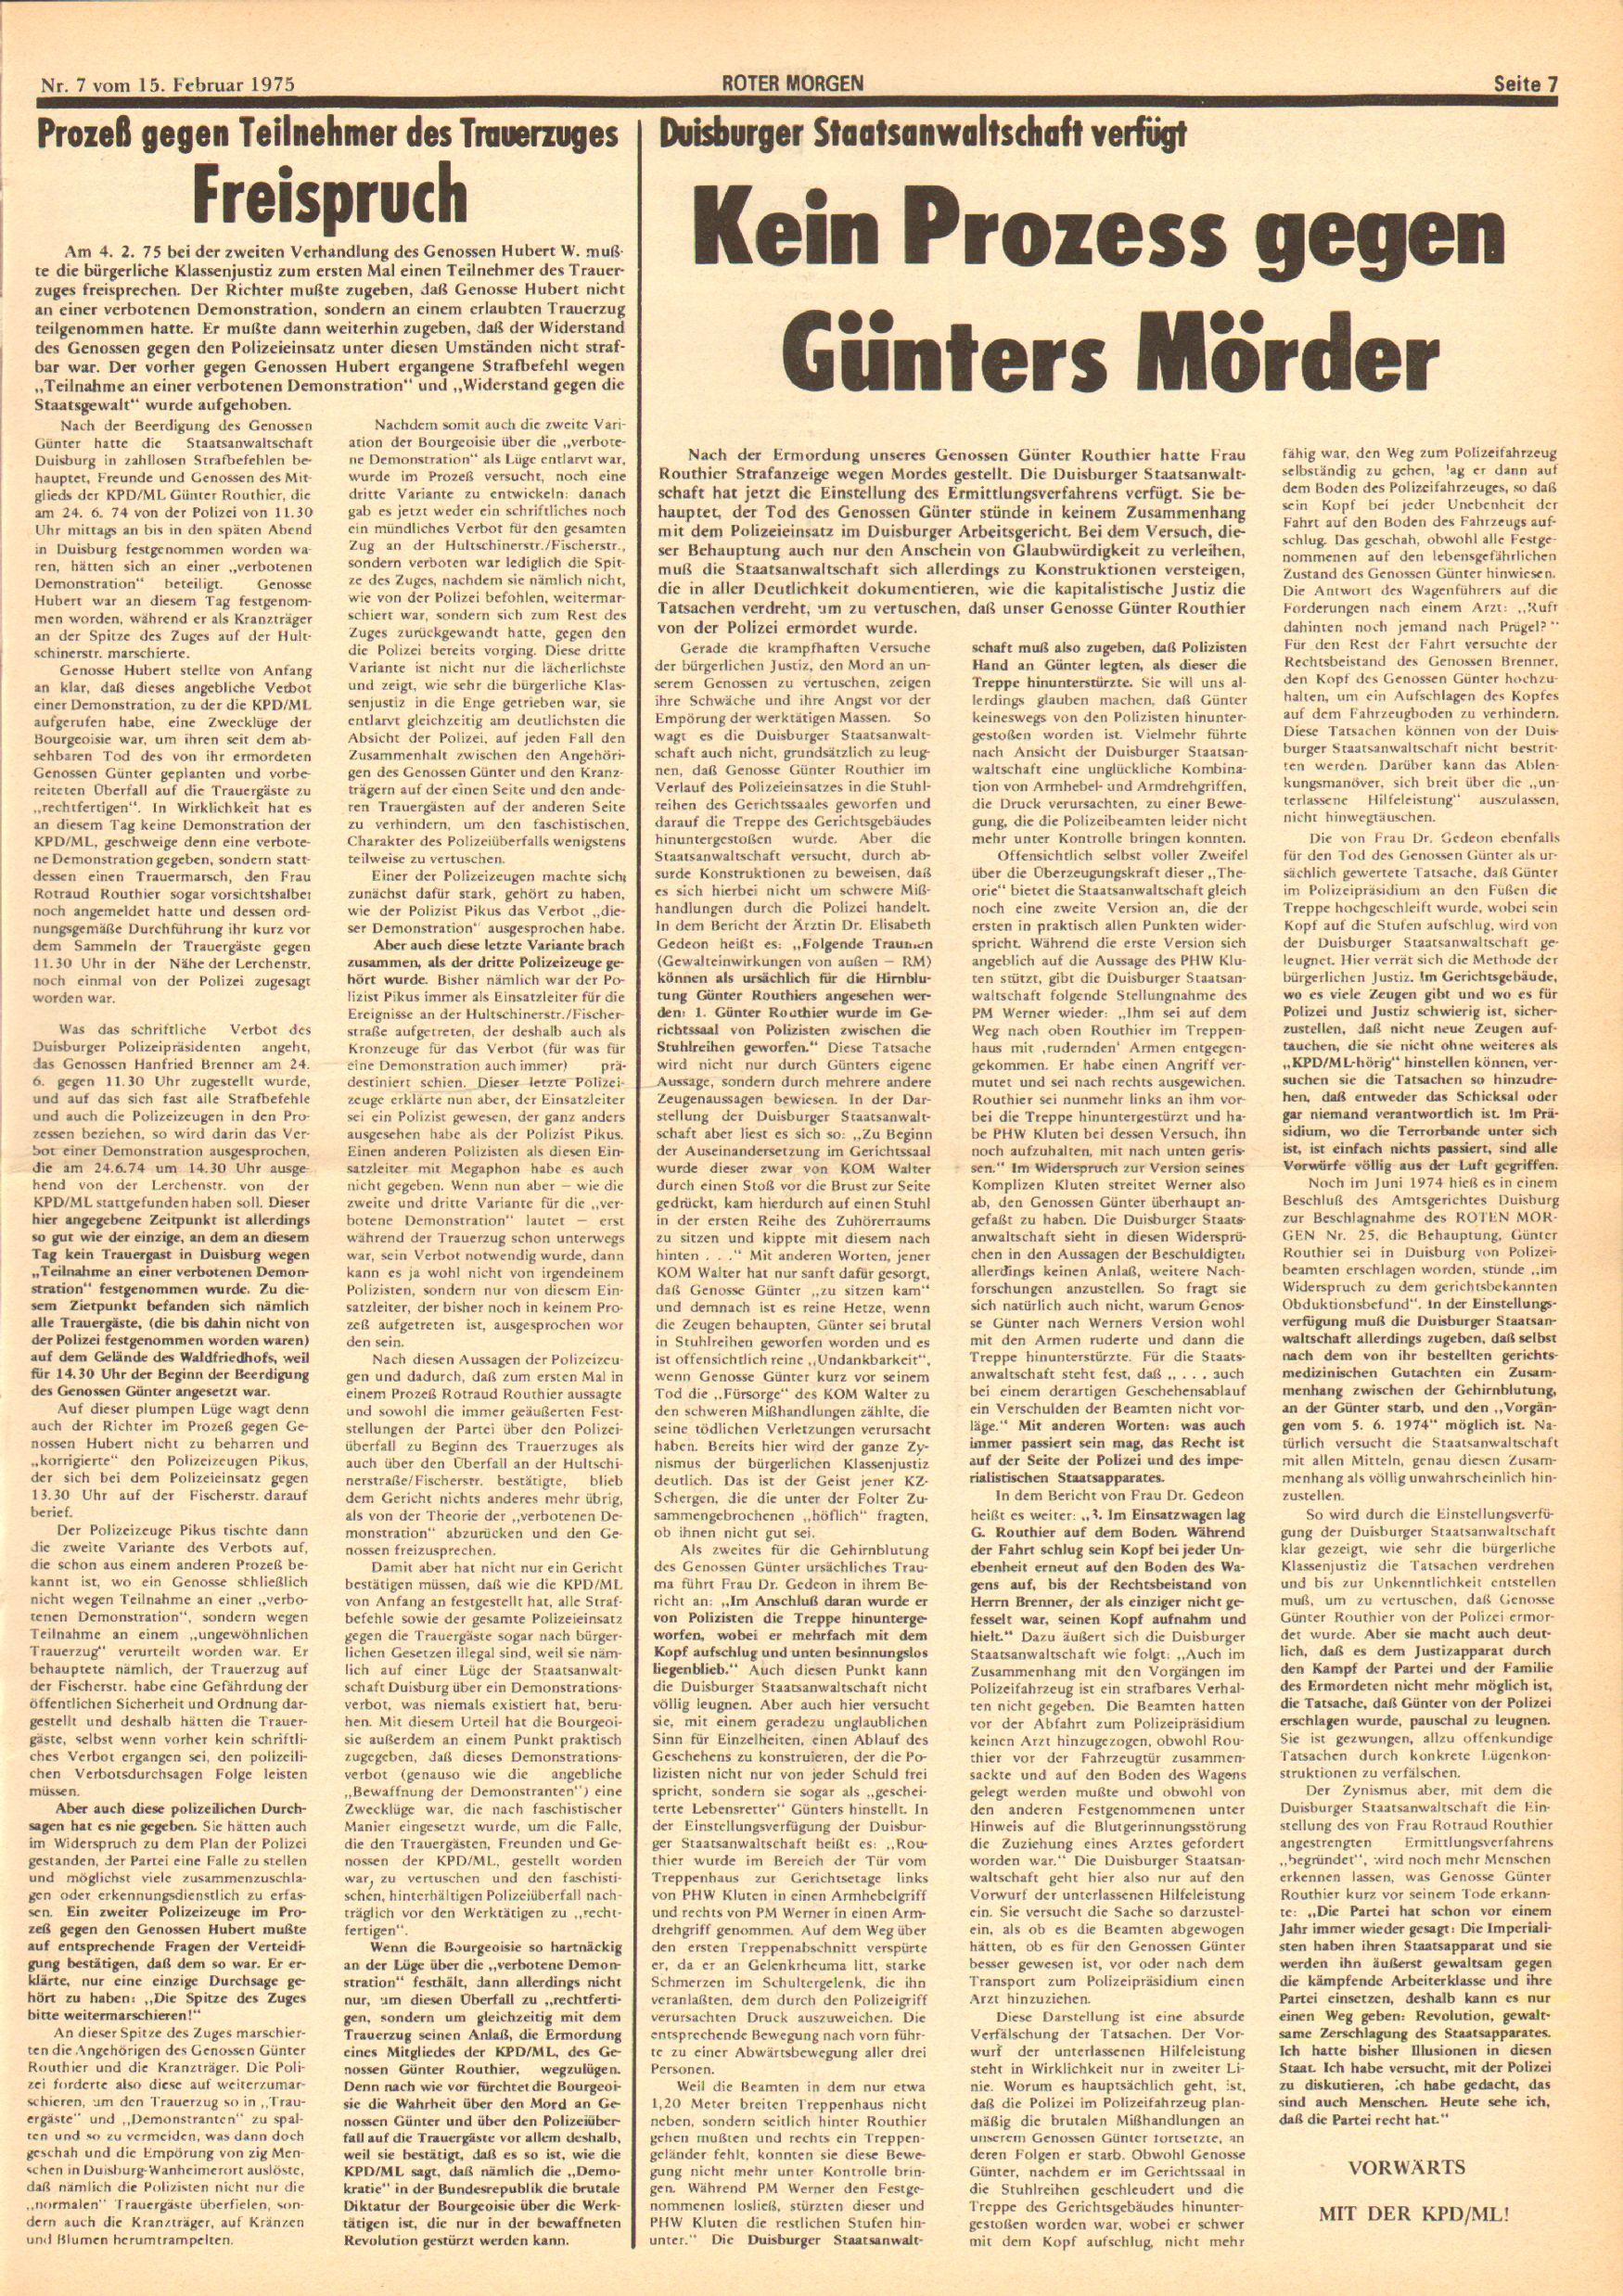 Roter Morgen, 9. Jg., 15. Februar 1975, Nr. 7, Seite 7